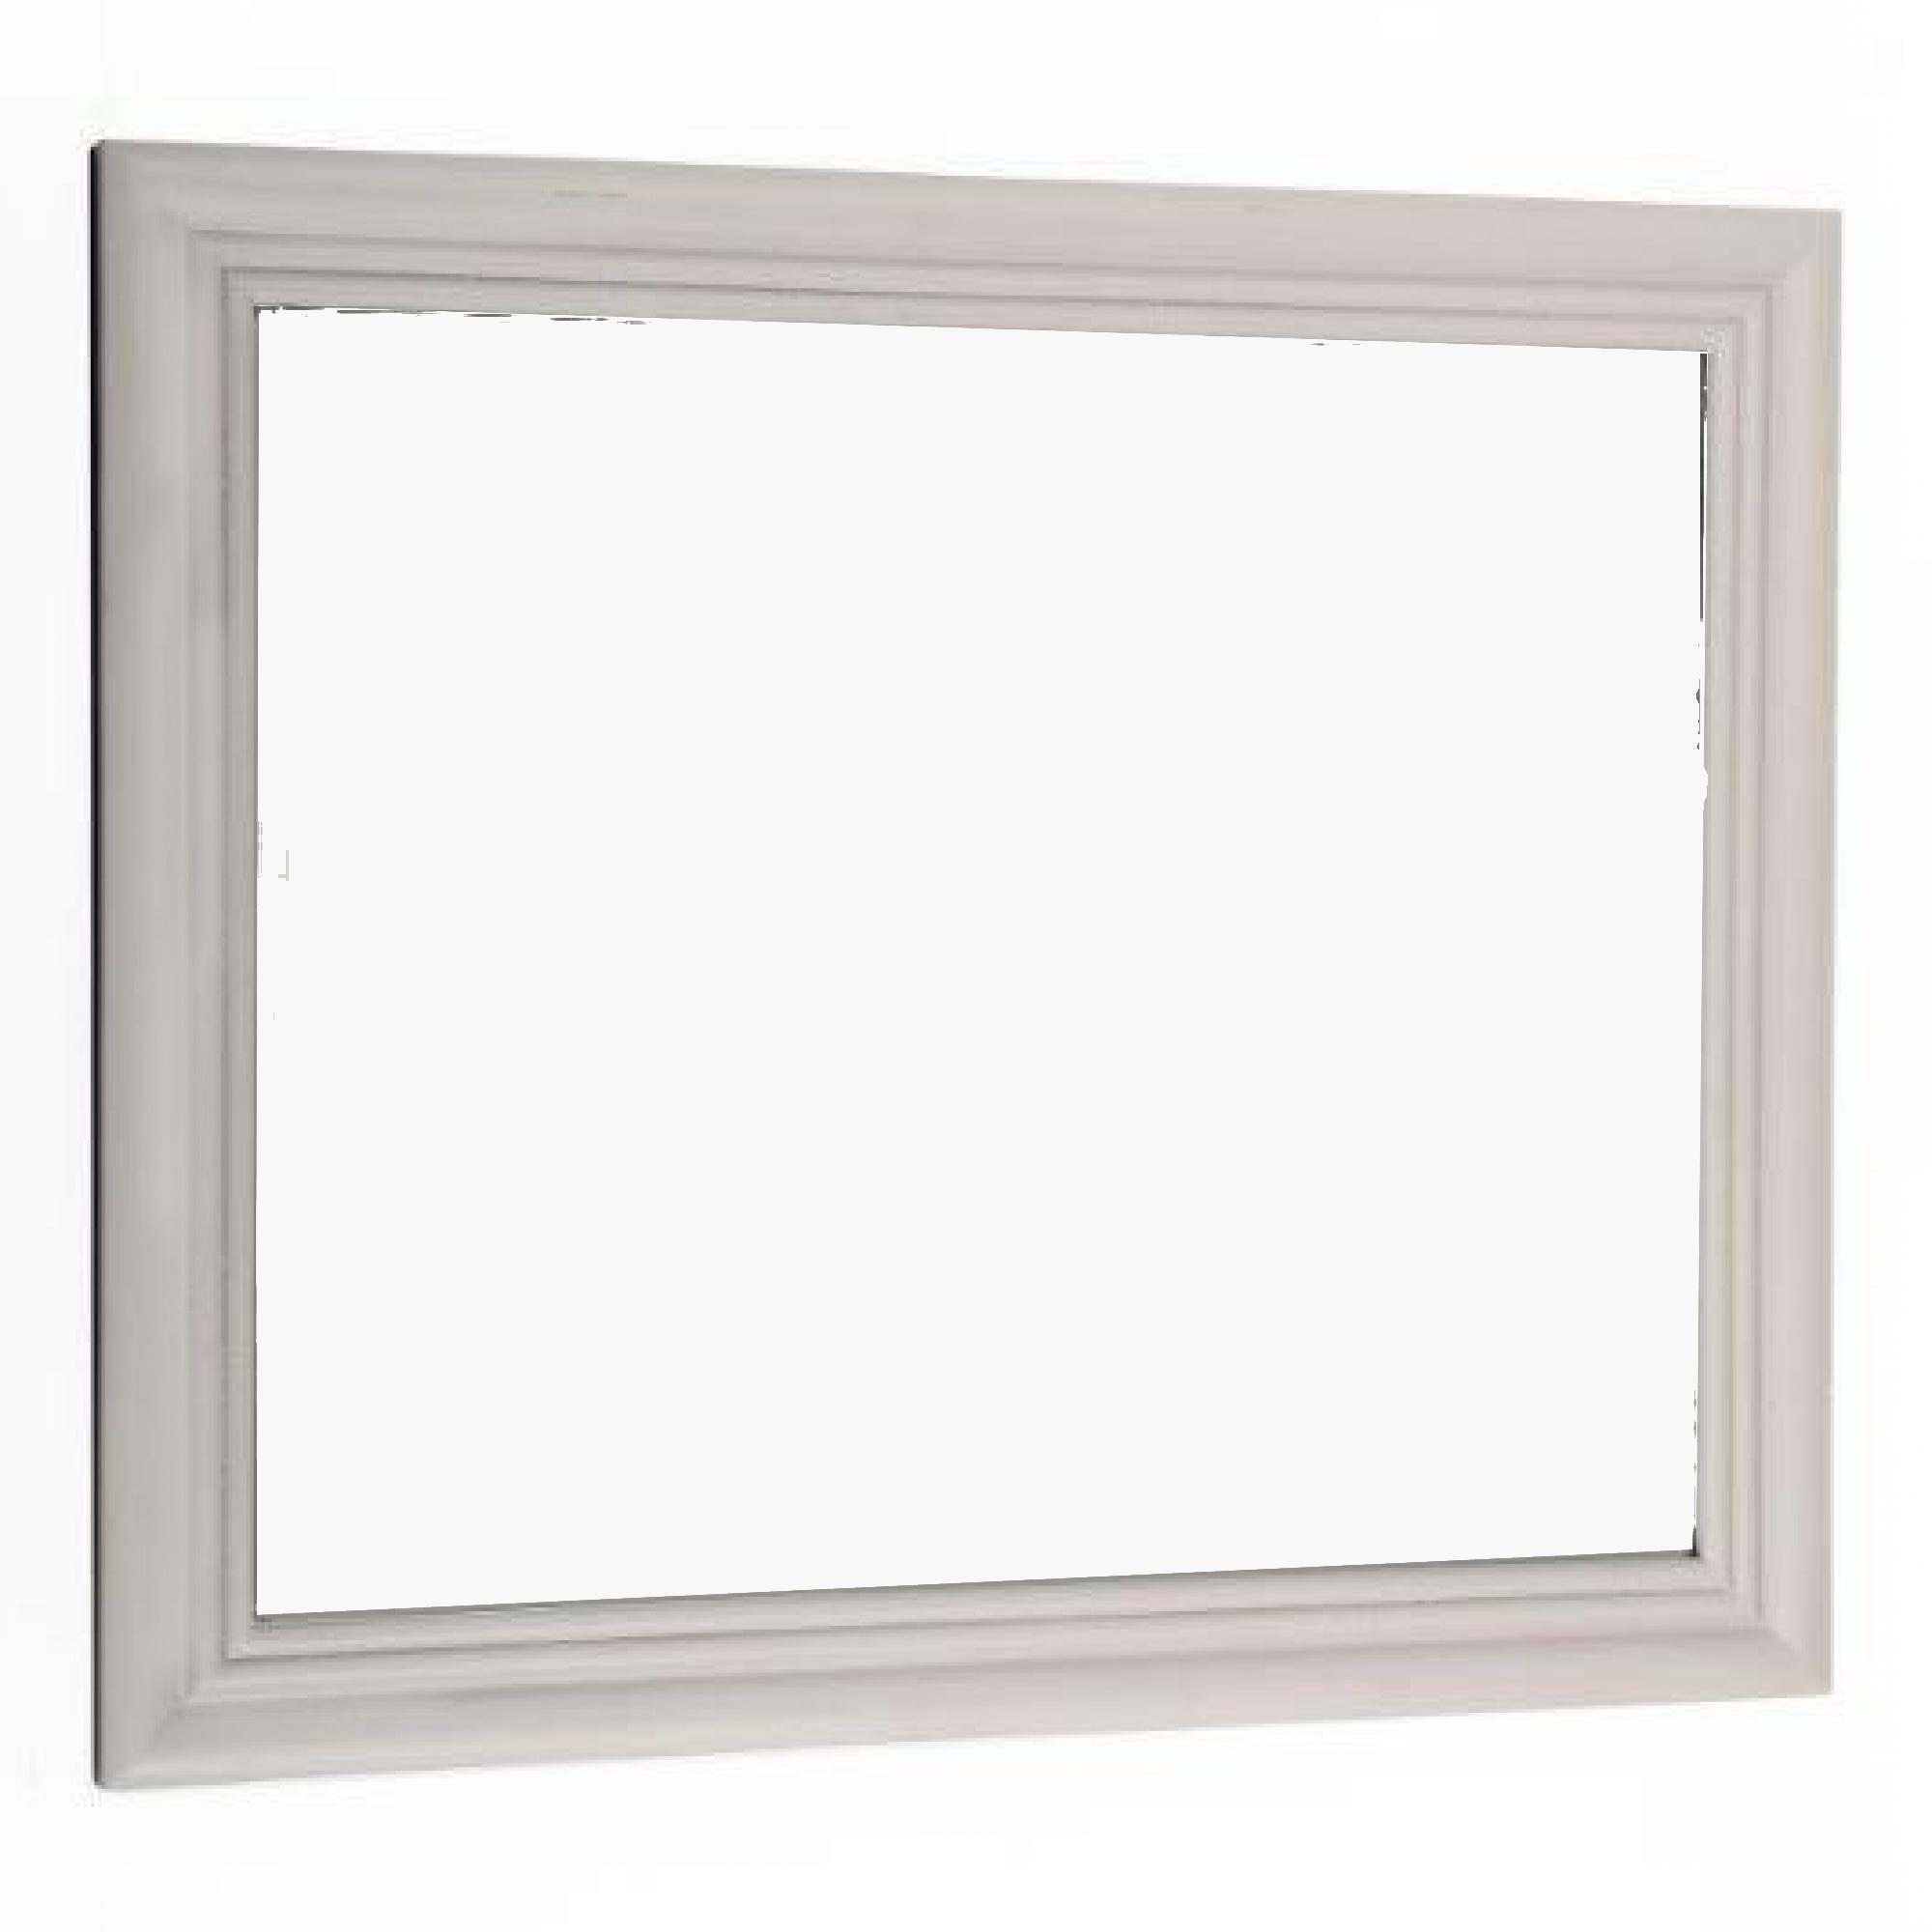 Plain & Simple Grey Bevelled Wall Mirror Wood Frame ... Plain Wooden Frame